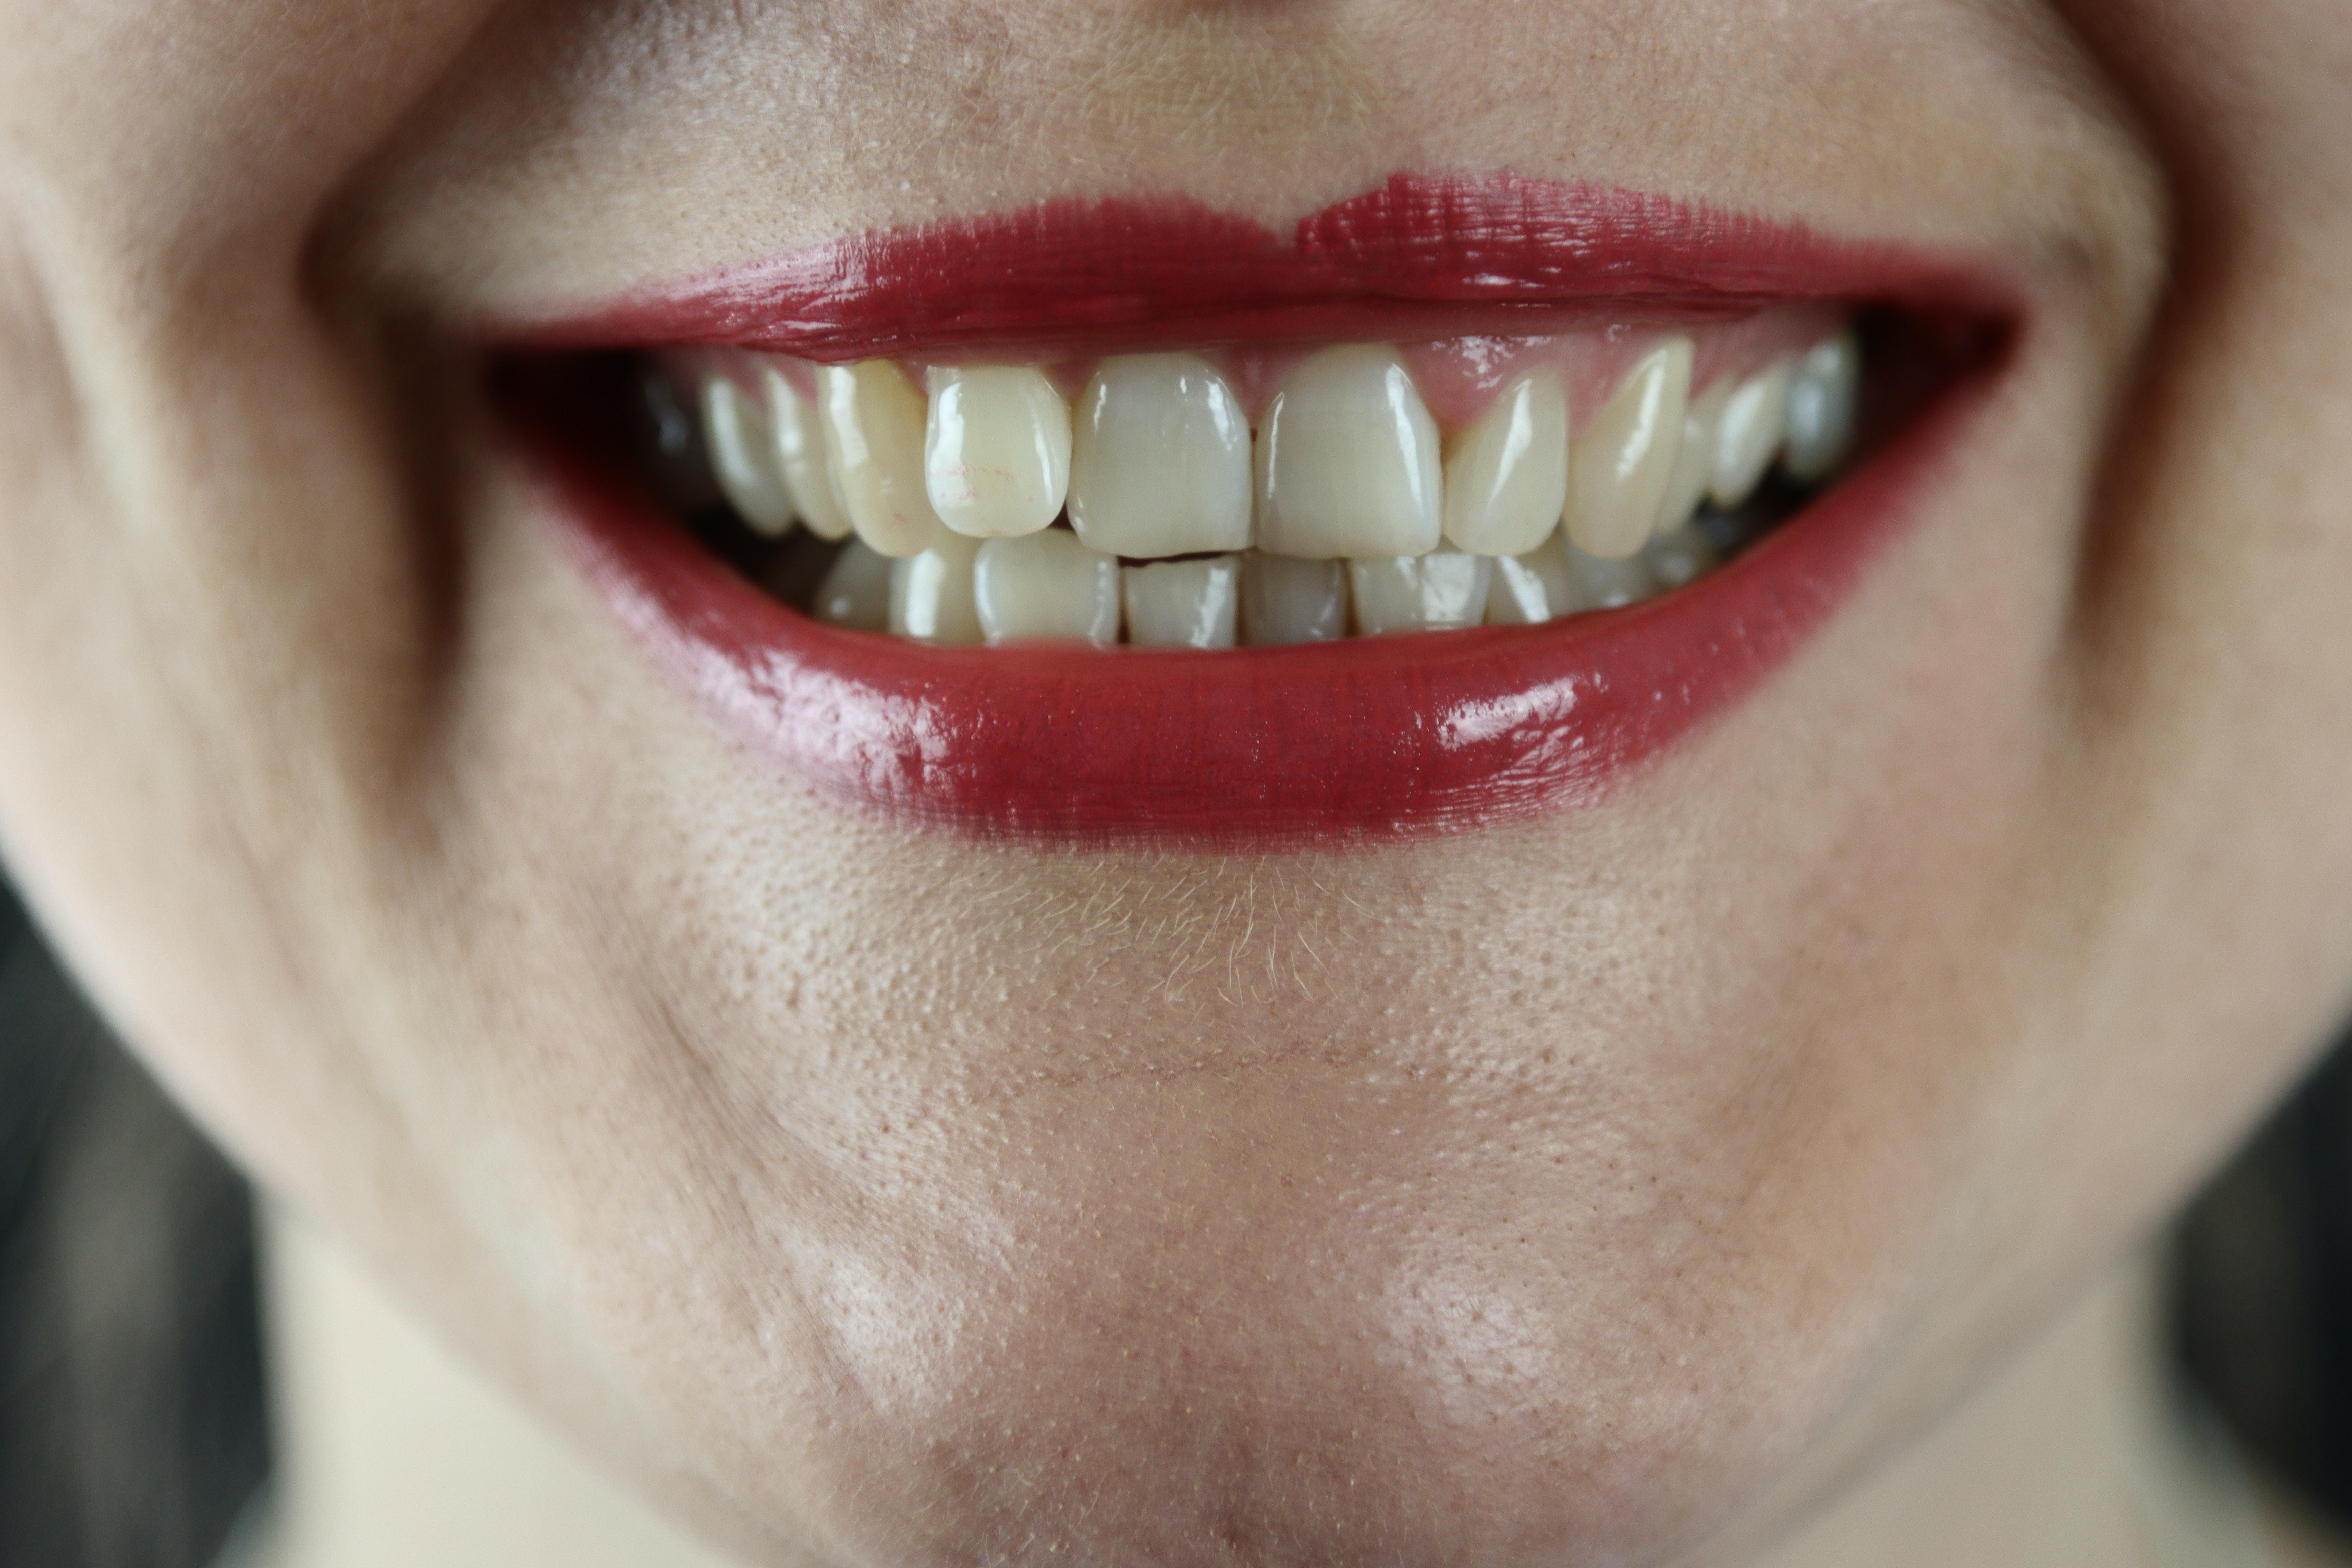 Depistarea ocluziei dentare incorecte. Cauze, simptome, tratament